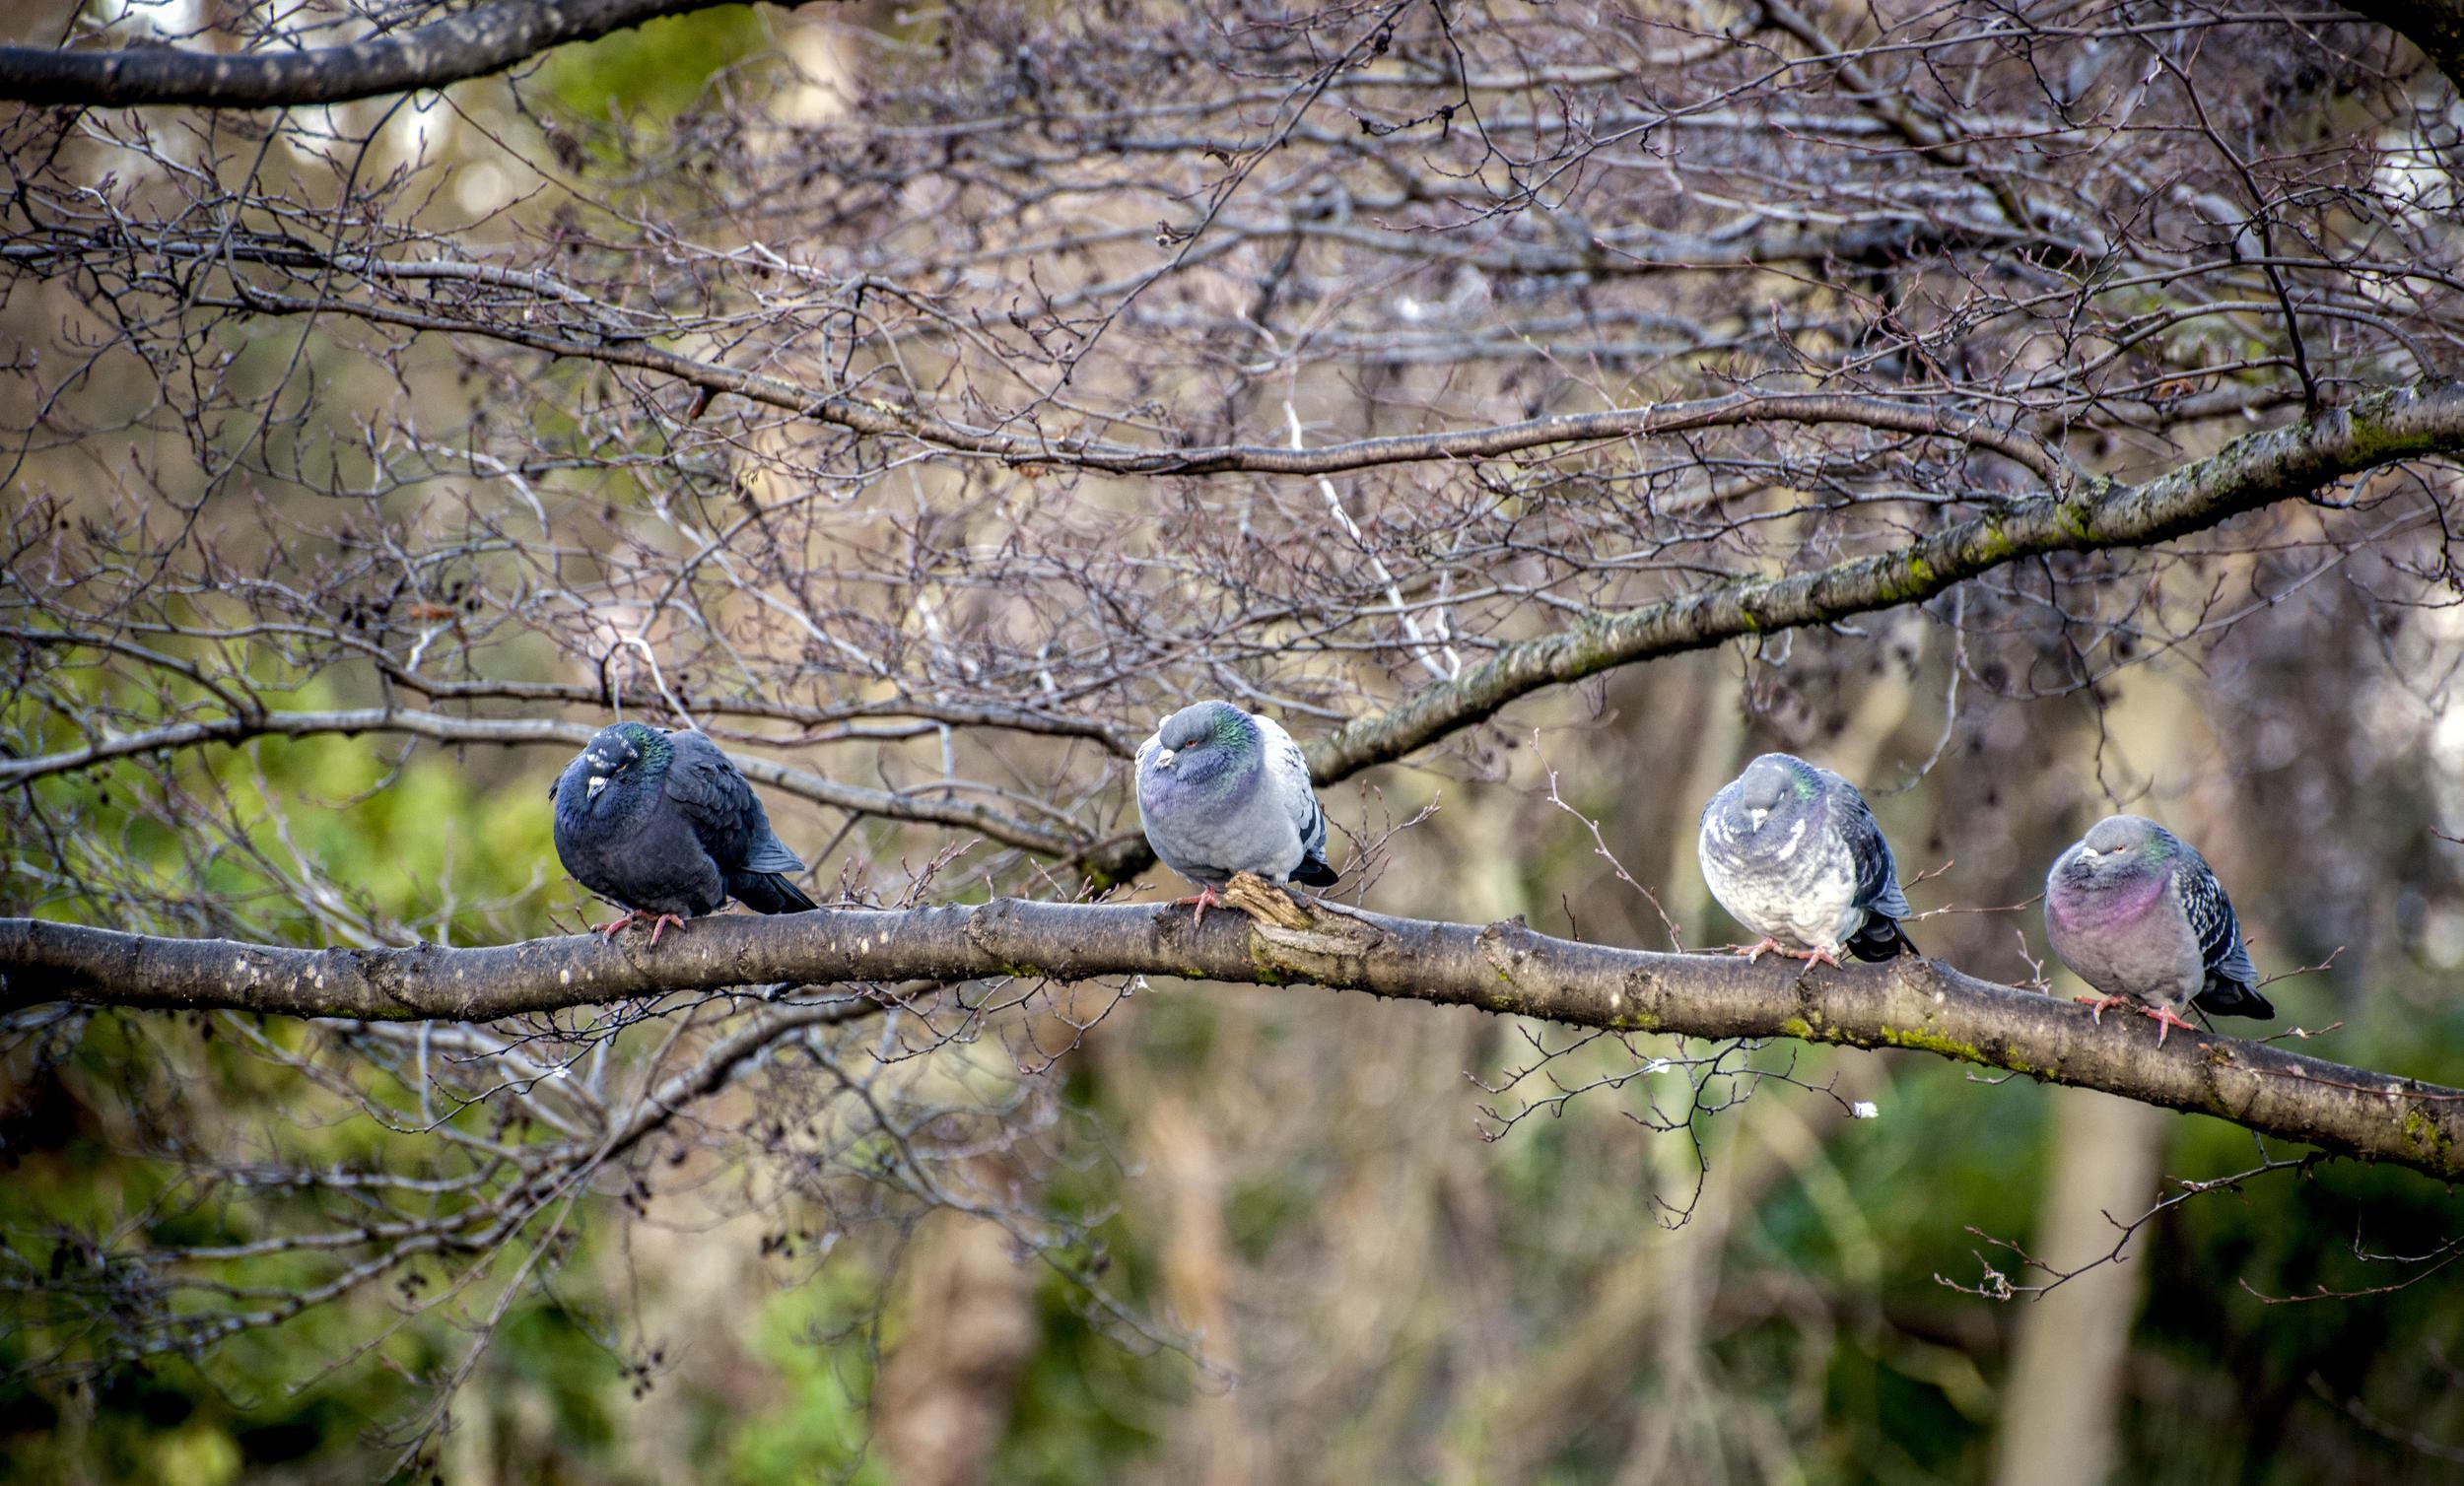 Pigeons in Regents Park, UK